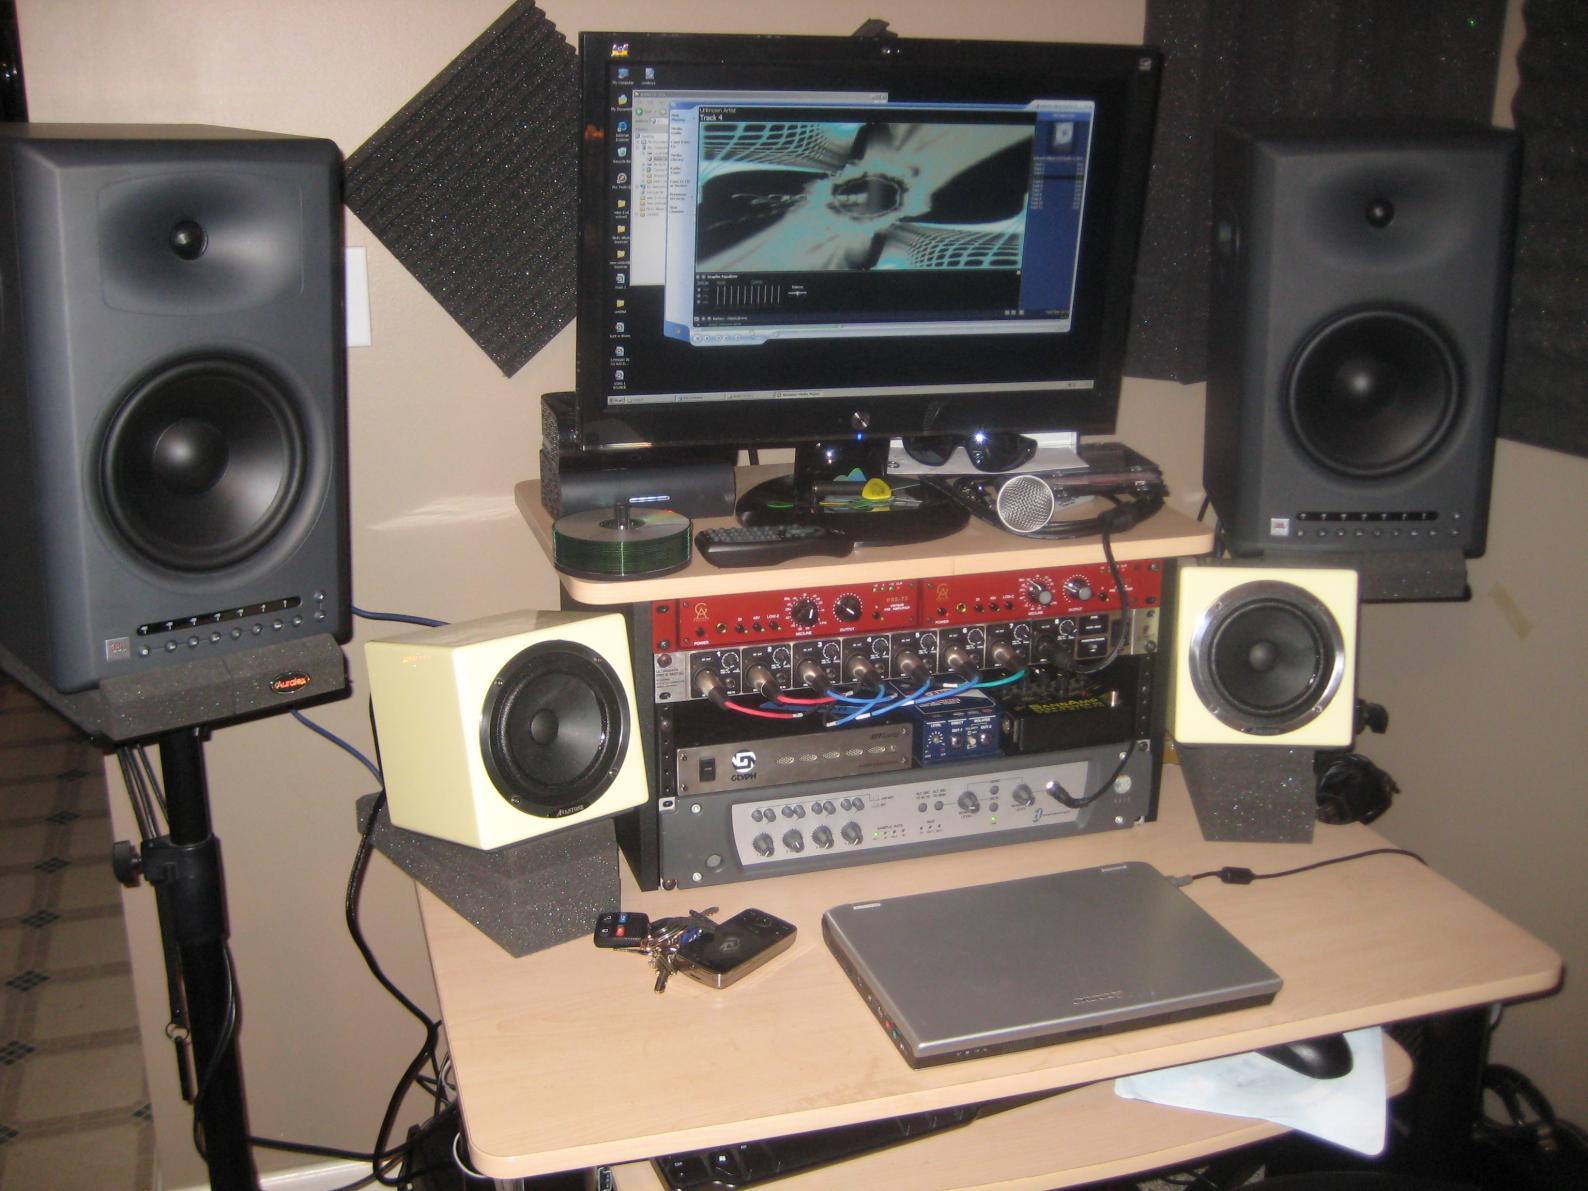 JBK LSR 4328 Studio Monitors